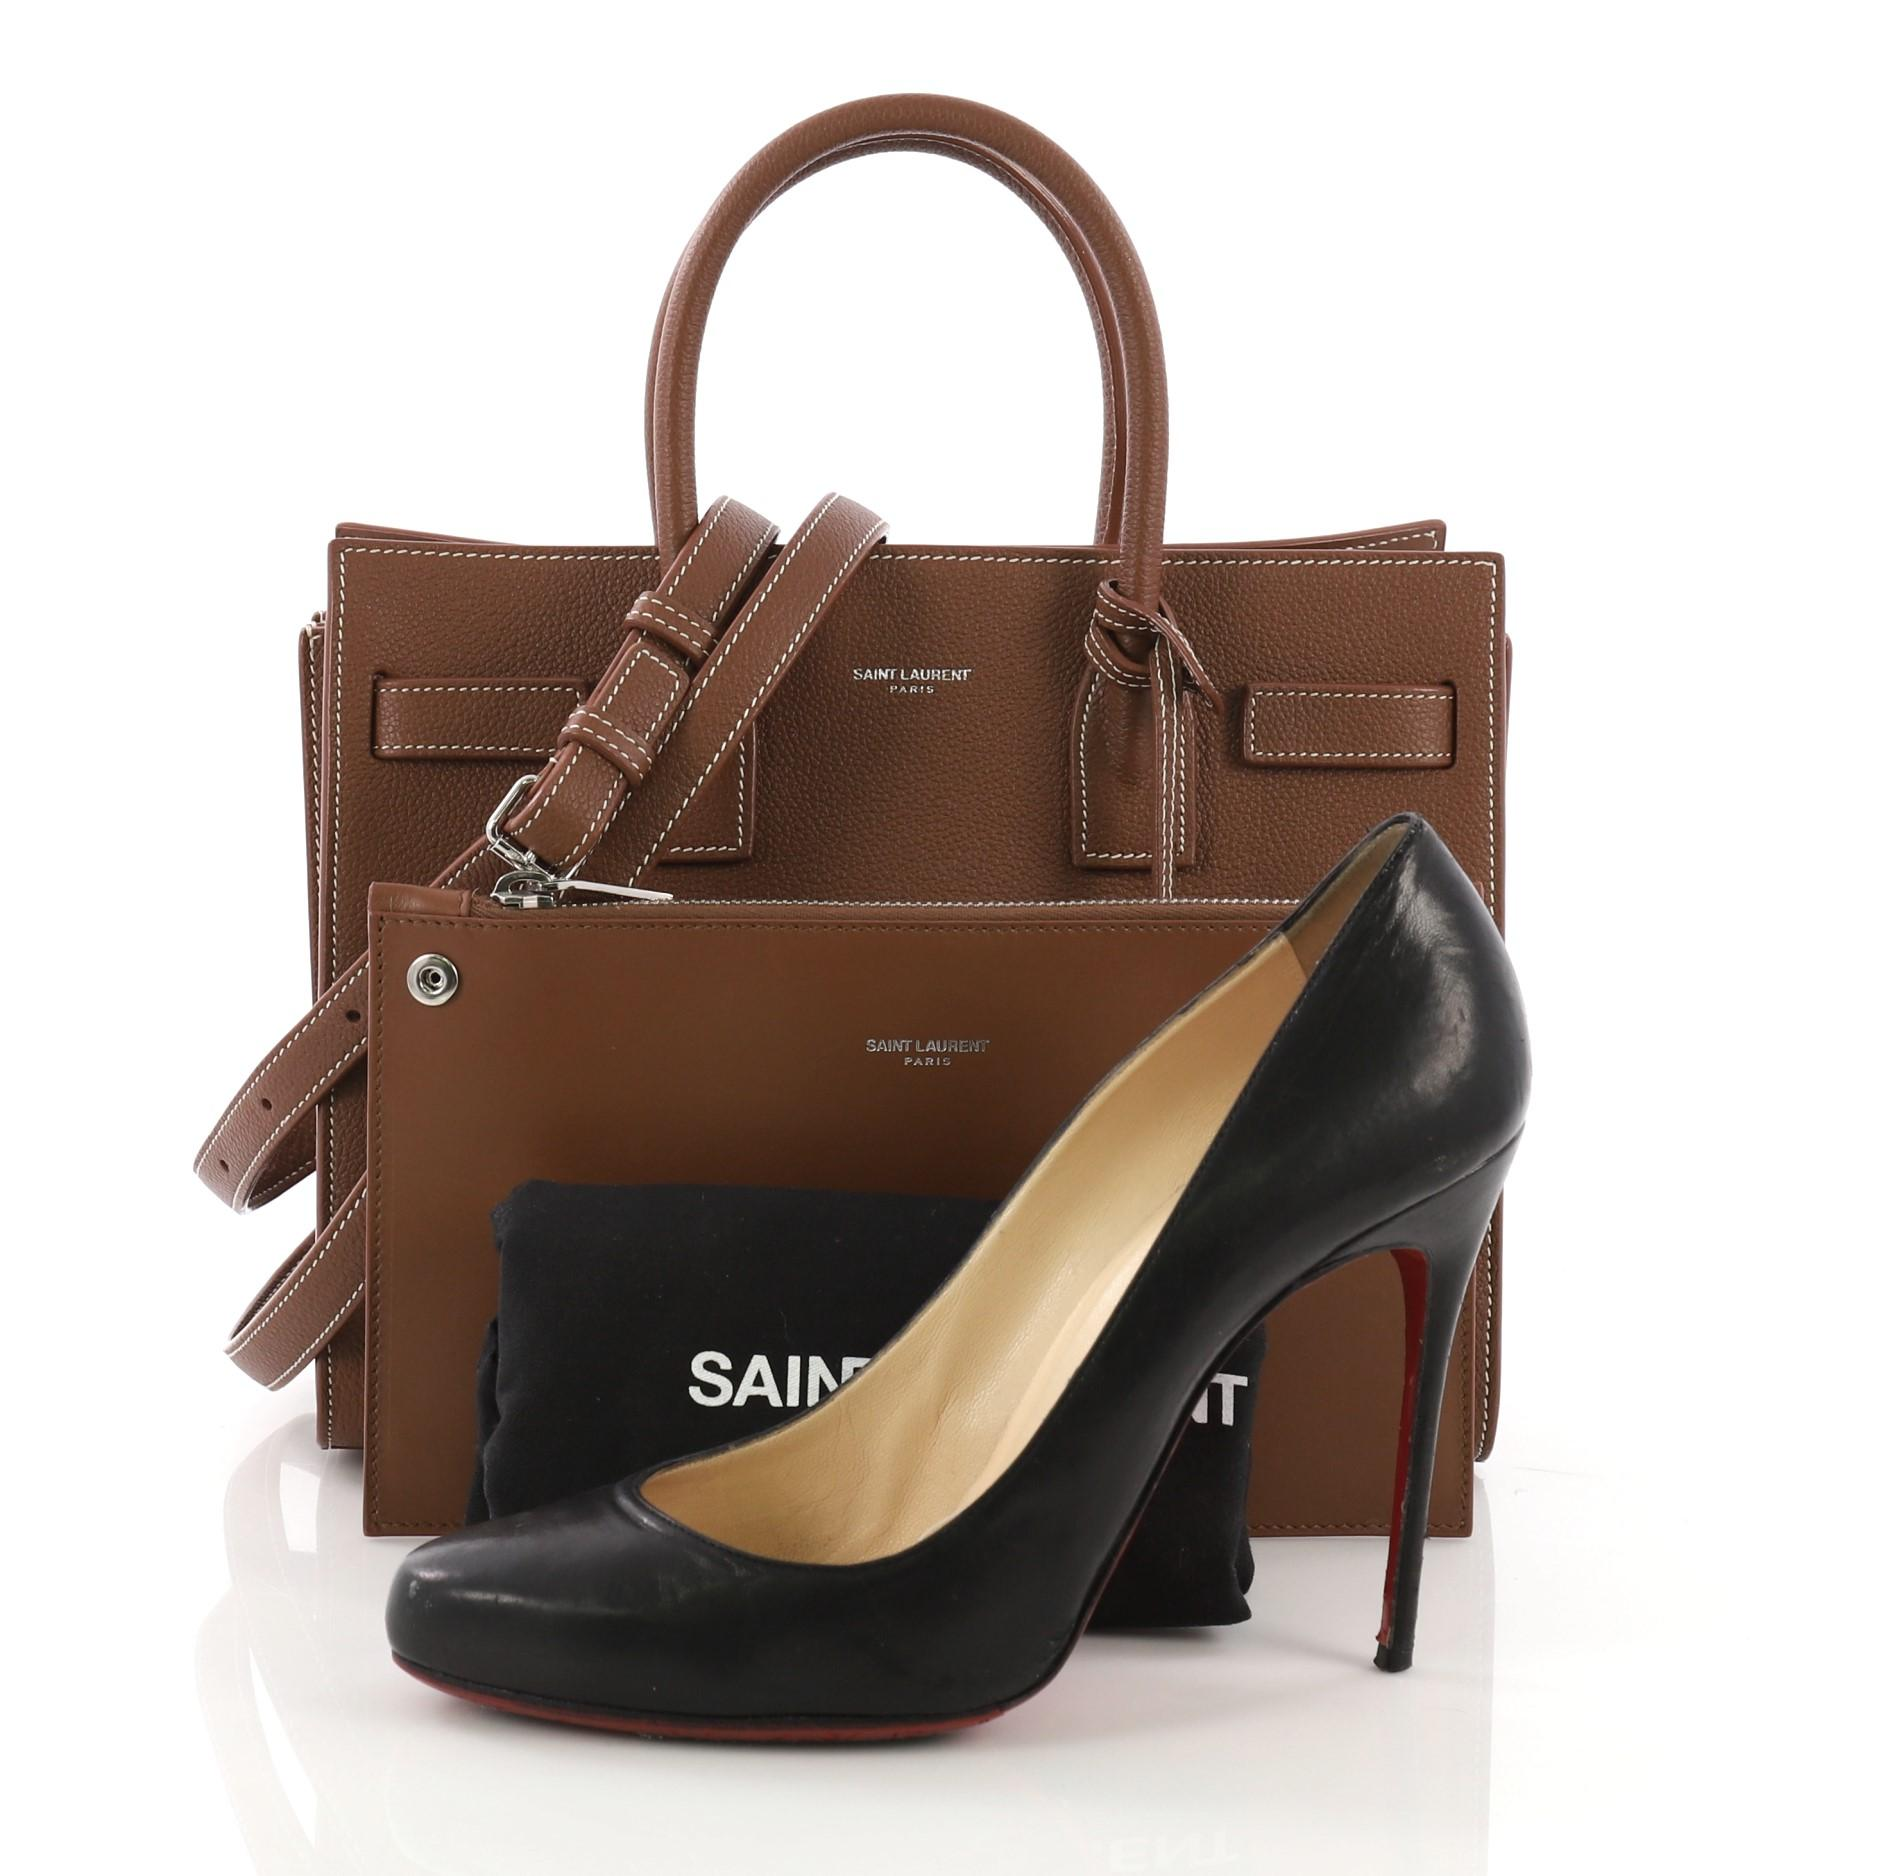 eb312429a0f Saint Laurent Sac de Jour NM Handbag Leather Baby at 1stdibs